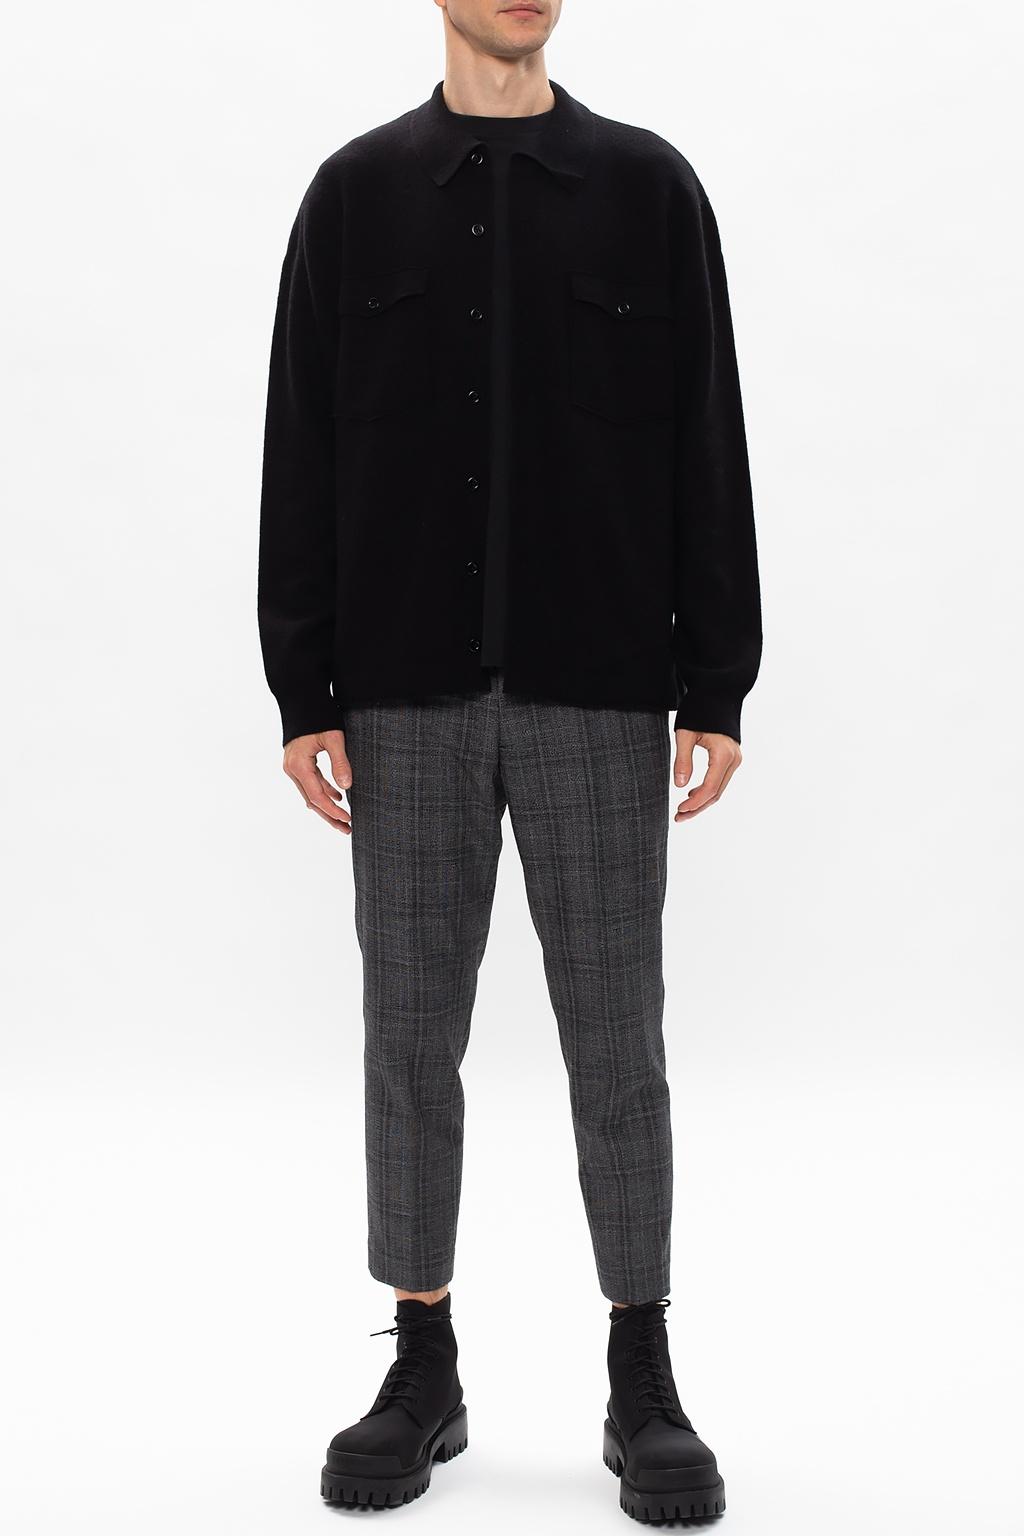 AllSaints 'Lori' wool cardigan